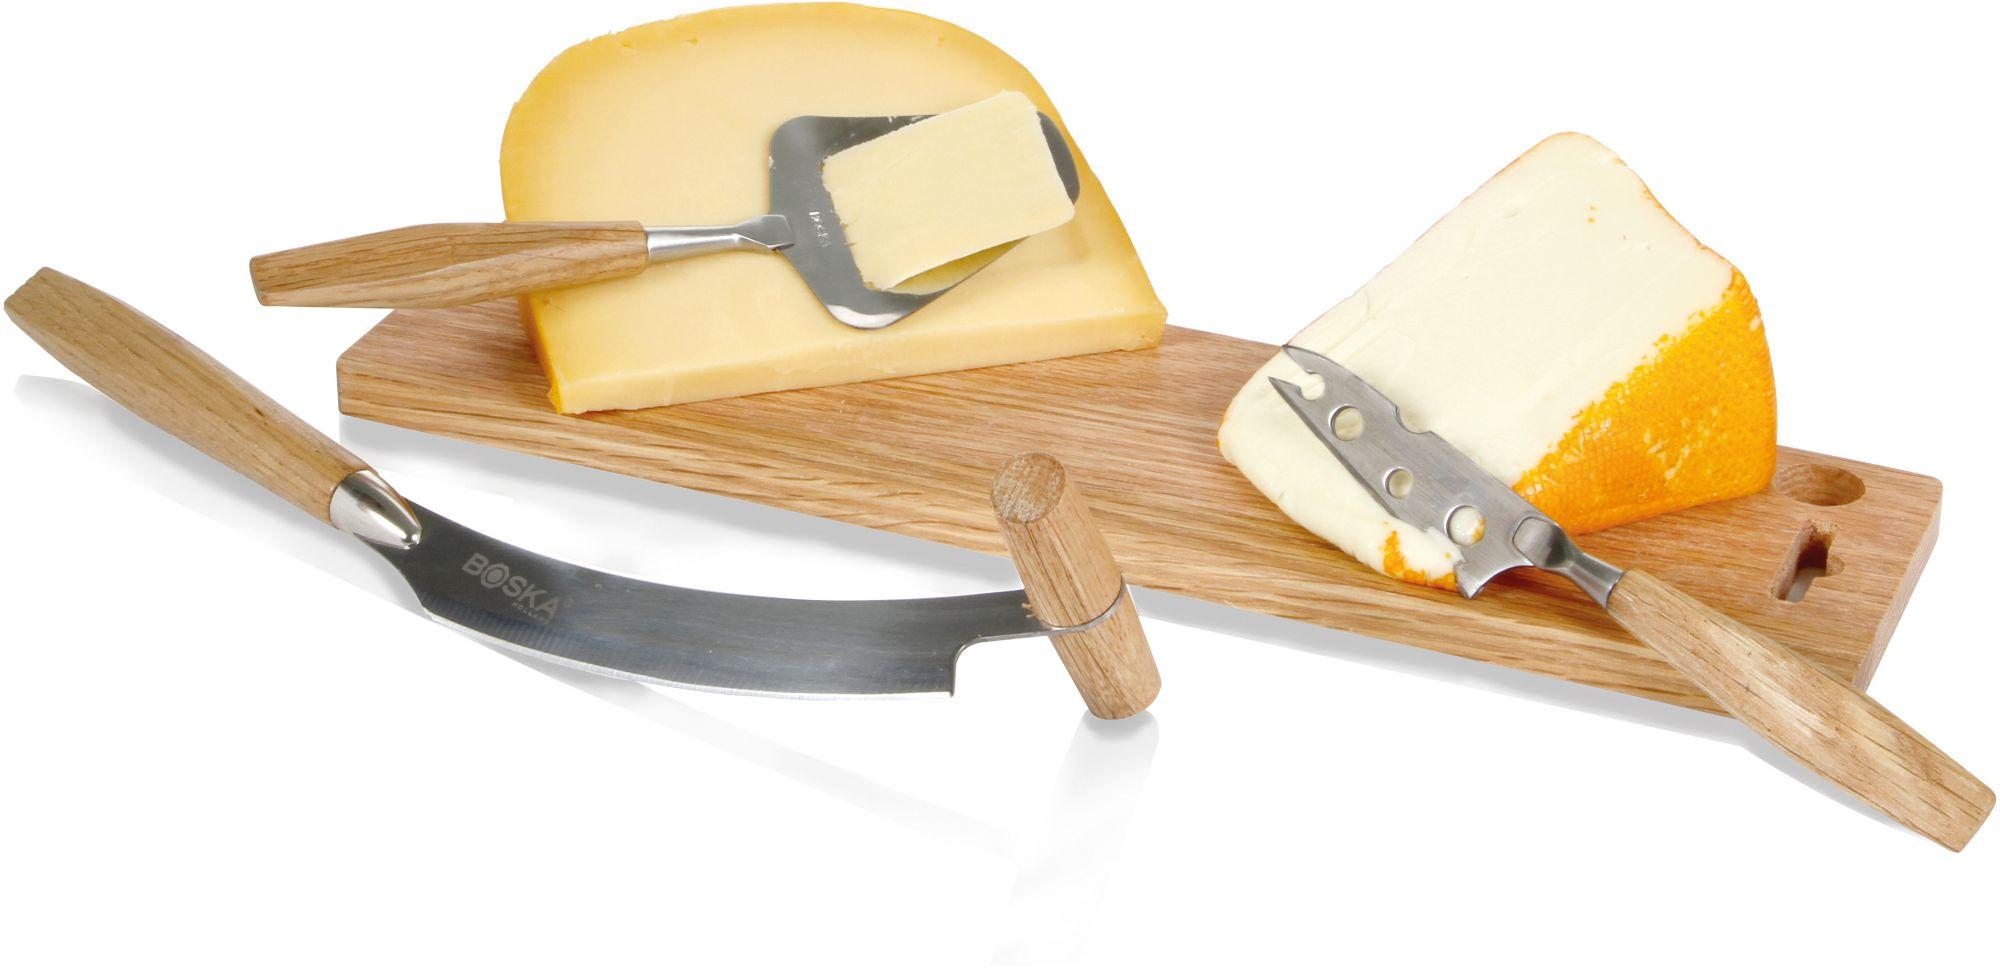 BOSKA HOLLAND BOSKA Holland Schneidbrett/Käsemesser, Set, Eichenholz, »Explore Cheese«